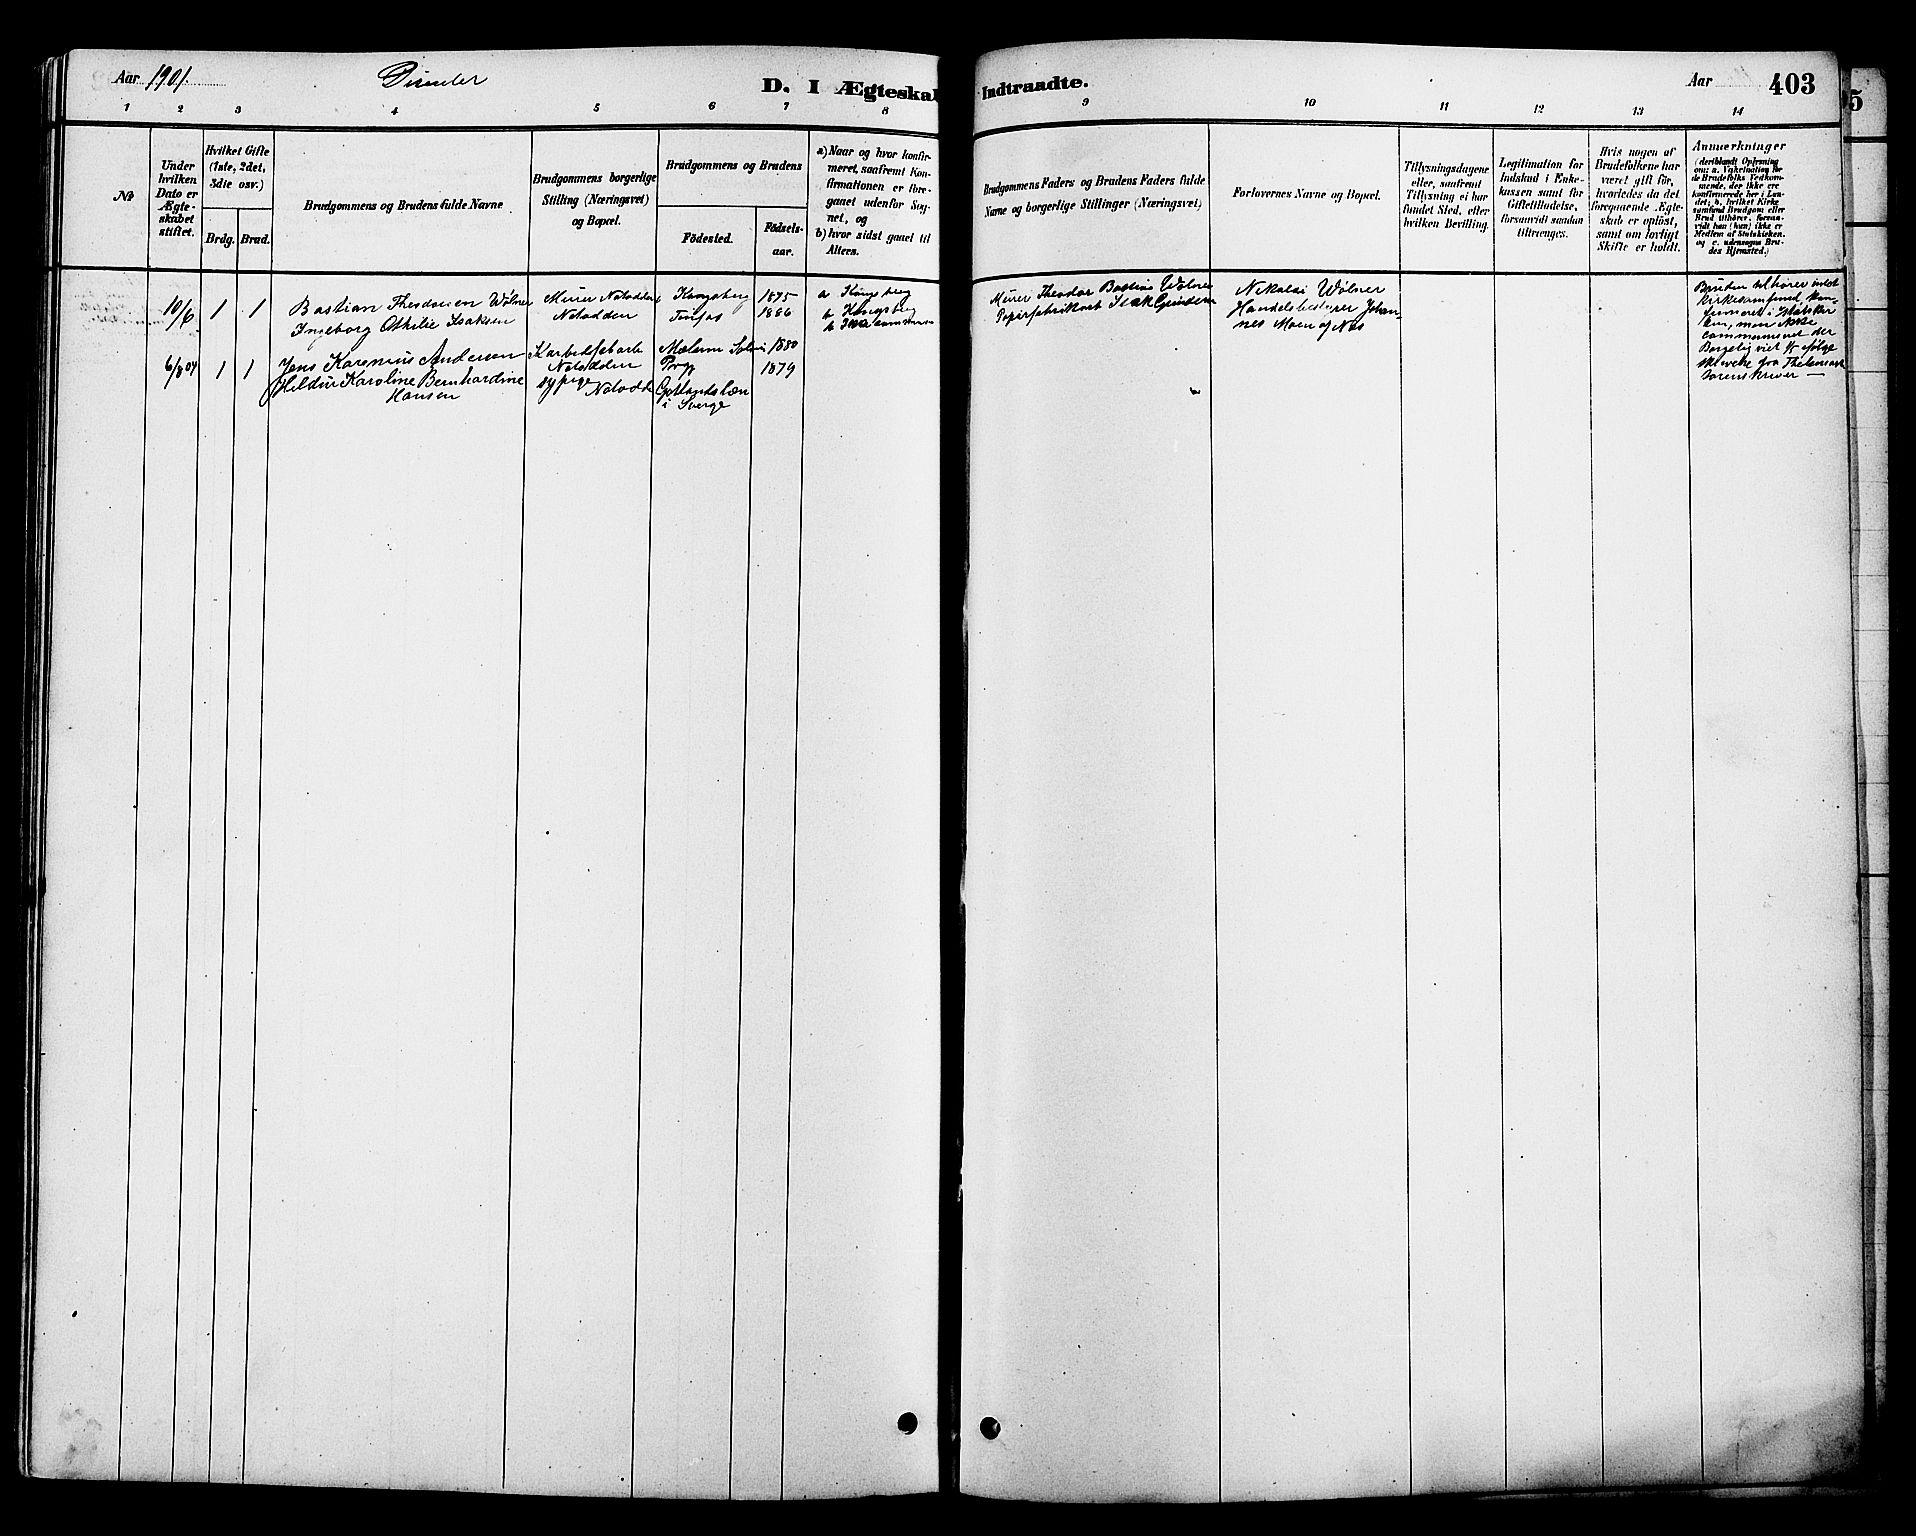 SAKO, Heddal kirkebøker, G/Ga/L0002: Klokkerbok nr. I 2, 1879-1908, s. 403